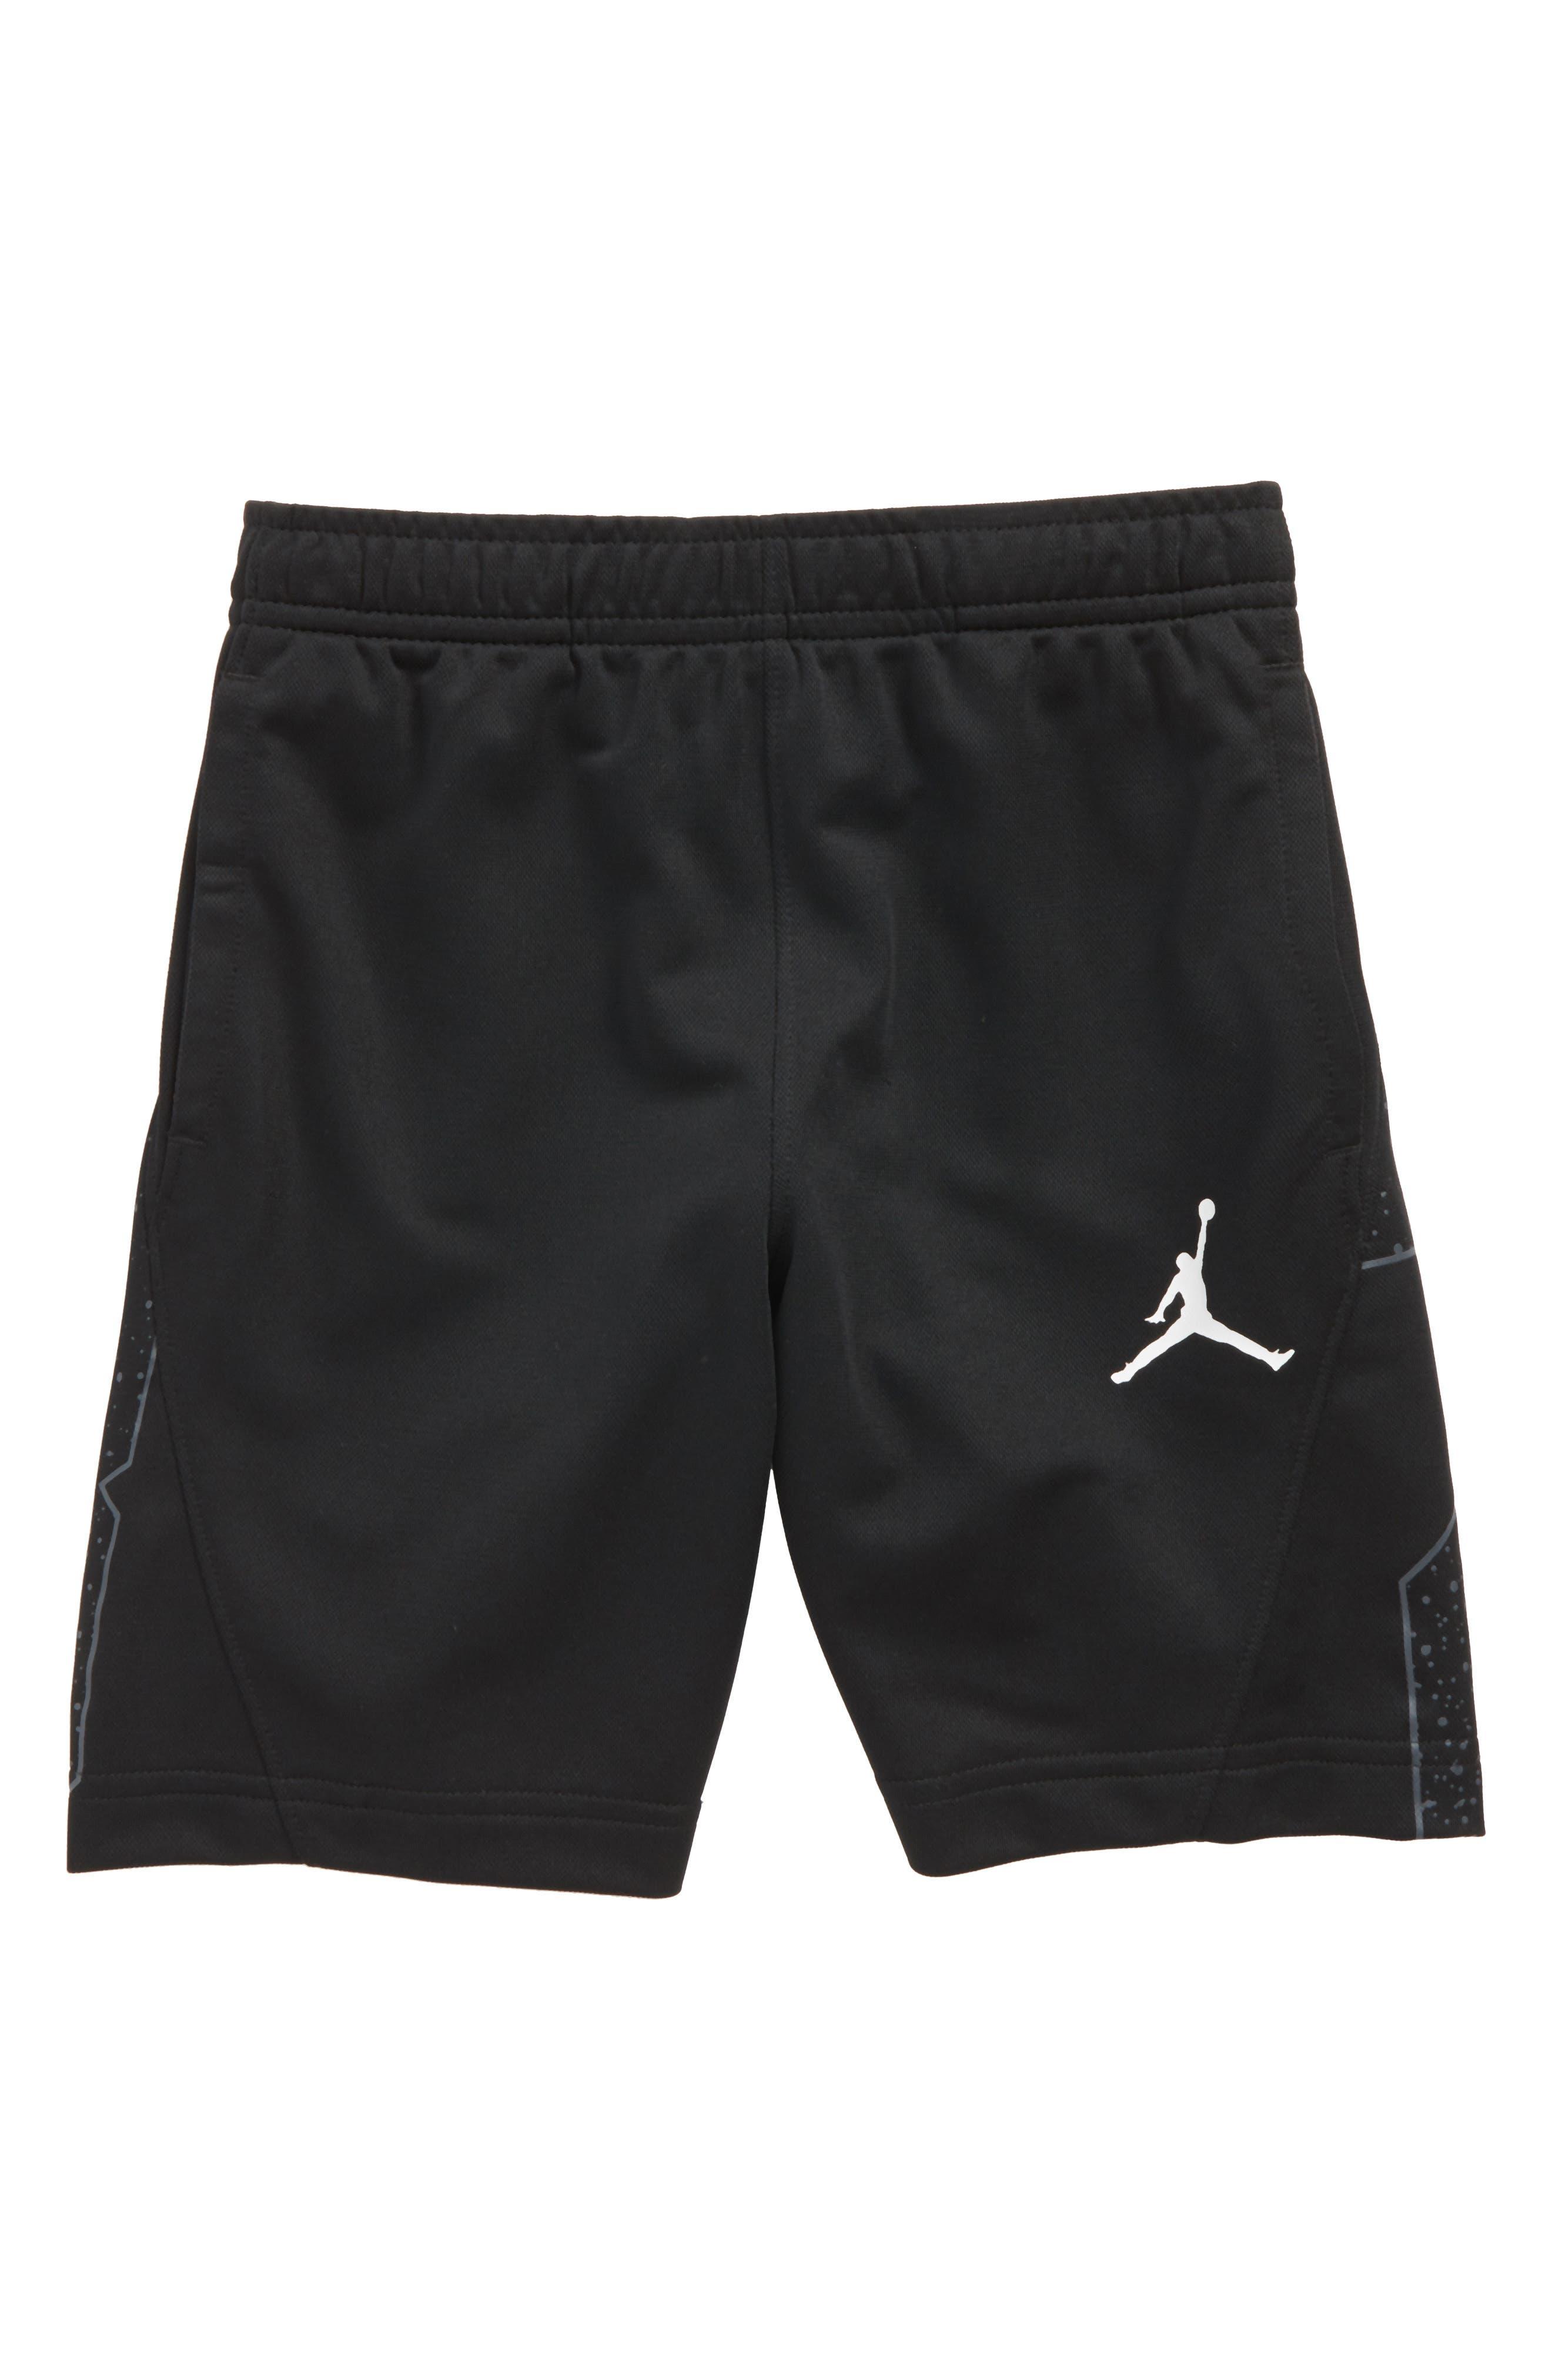 Jordan Dry Speckle 23 Training Shorts,                         Main,                         color, Black